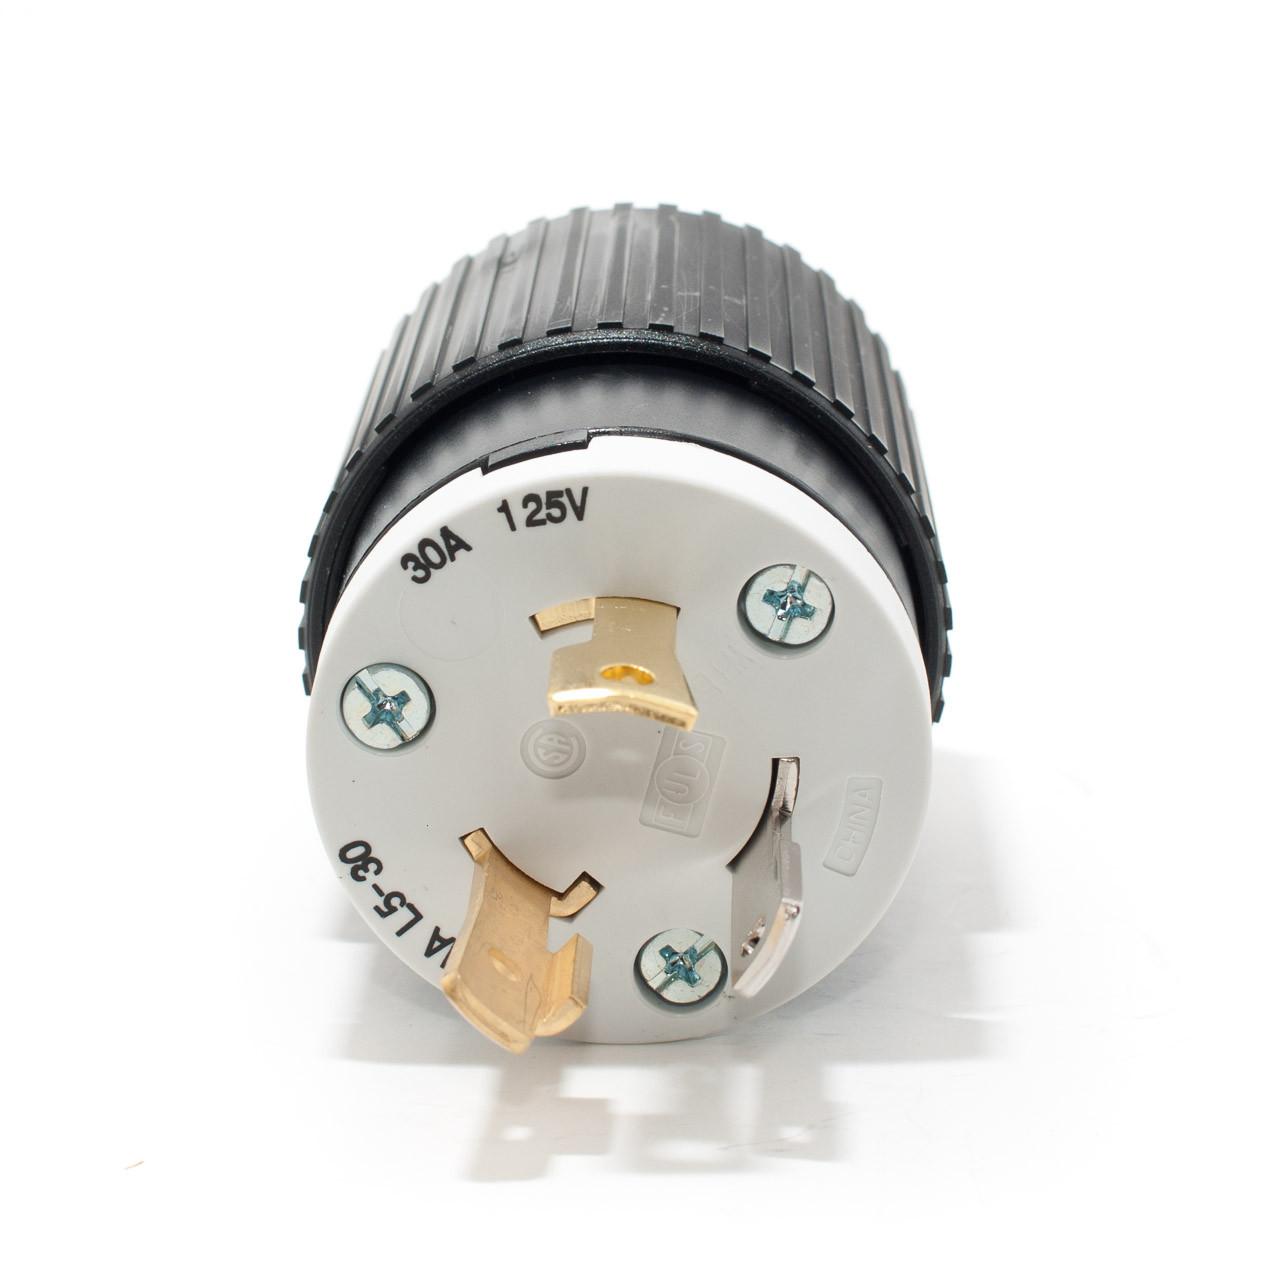 L5 30 2P3W 30A 125V Twist Lock Plug TremTech Electrical